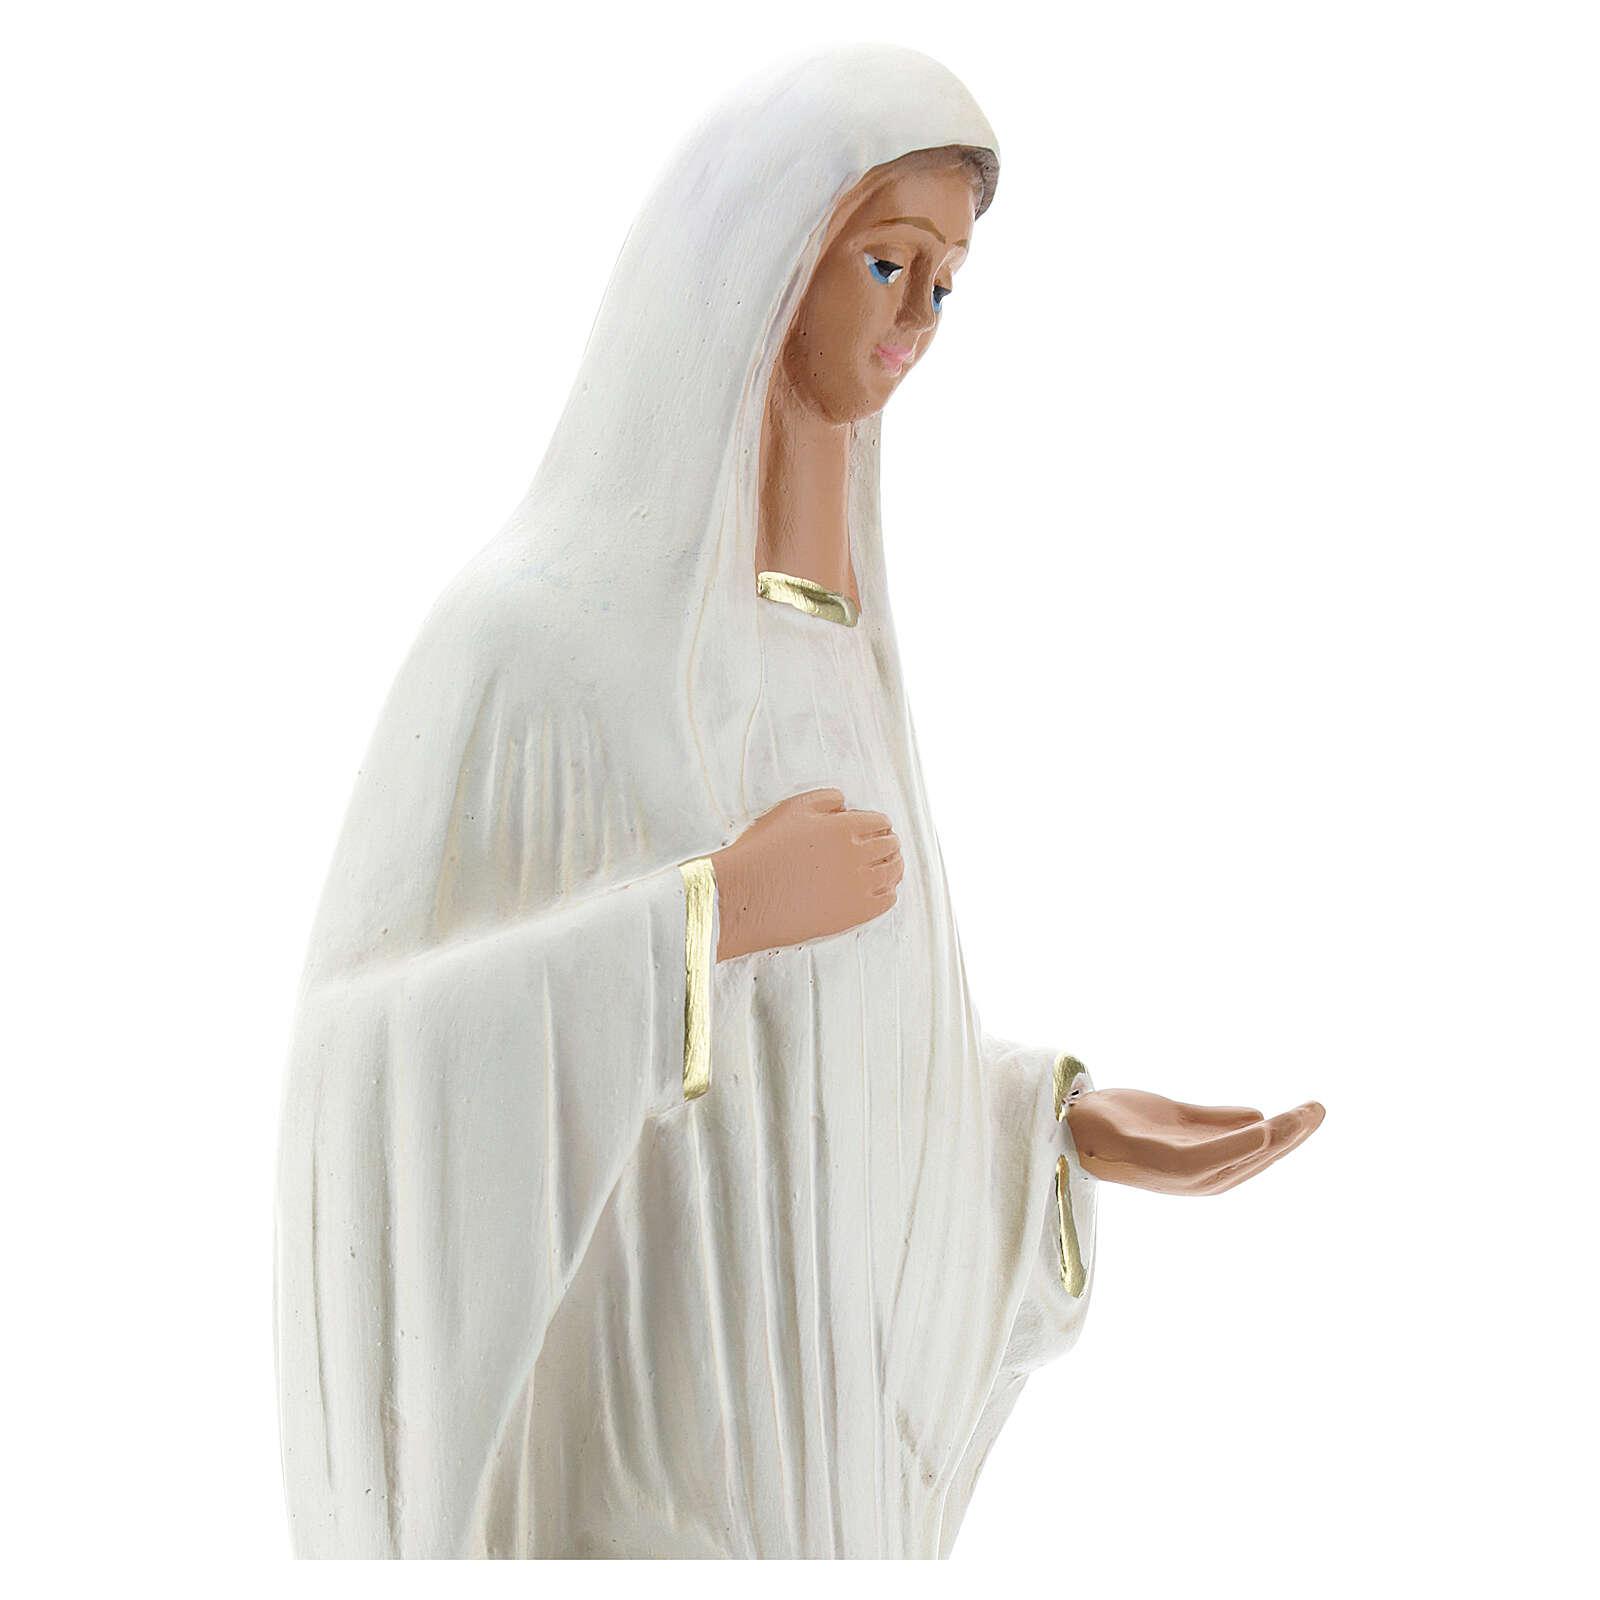 Statua Madonna Medjugorje 30 cm gesso dipinto Barsanti 4